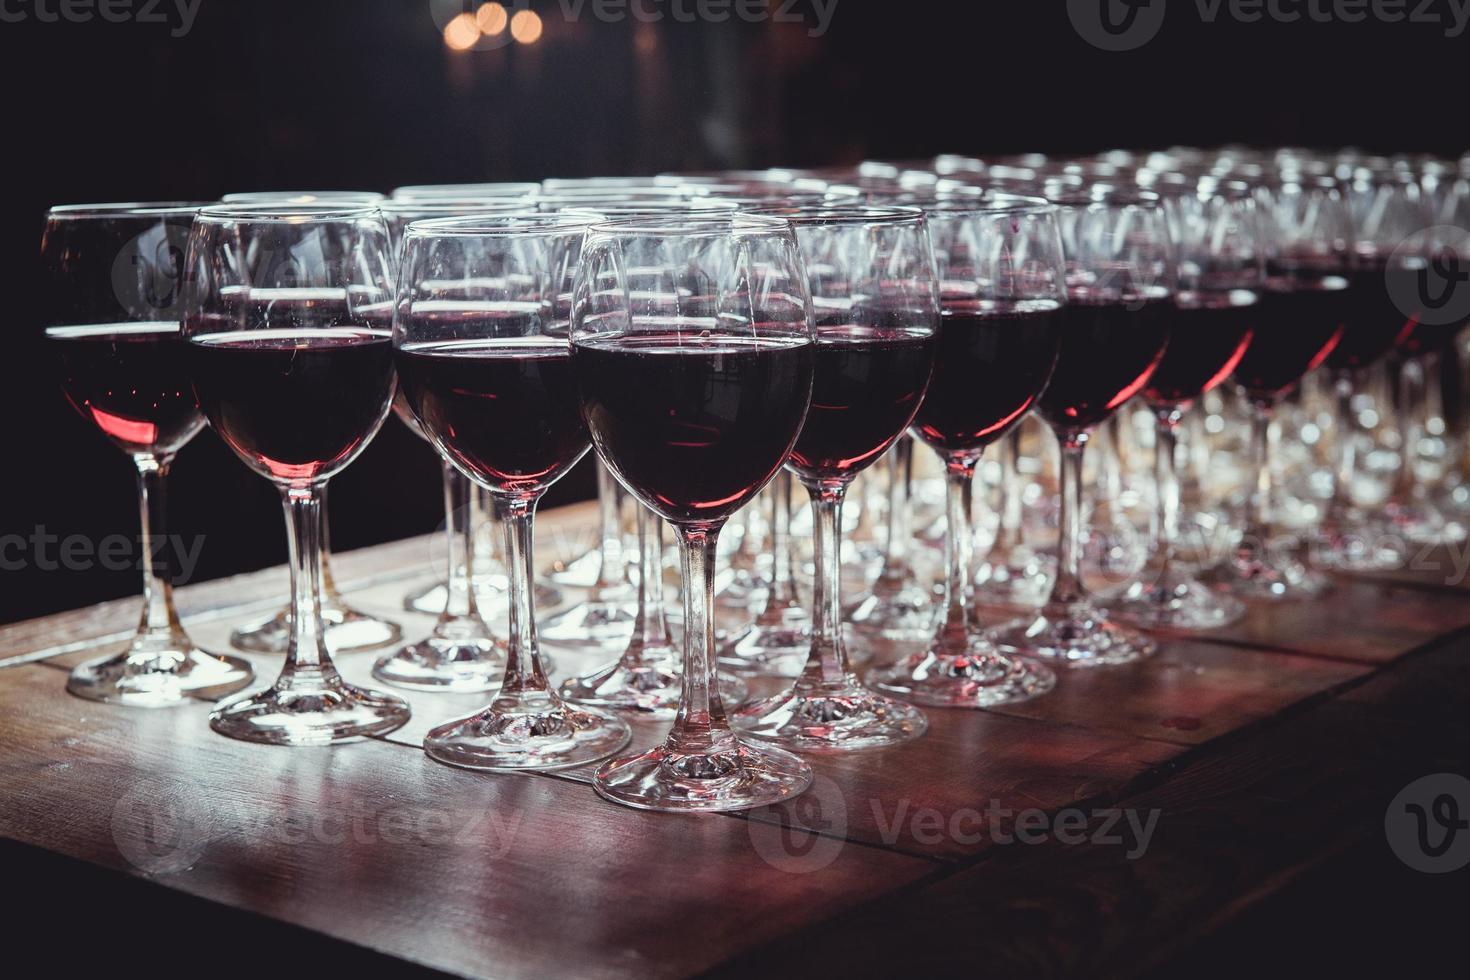 copas con vino en la mesa foto